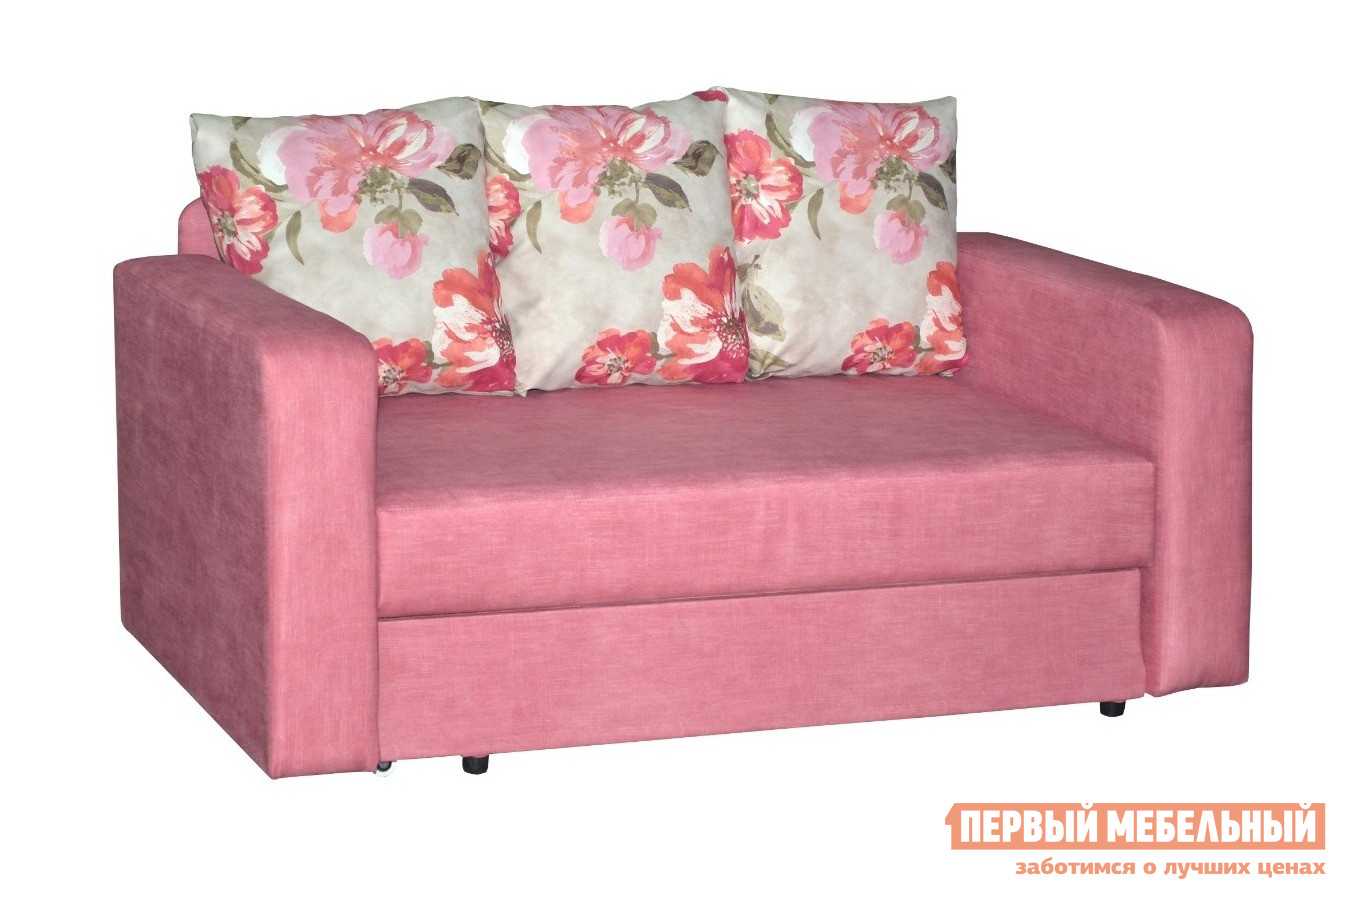 Диван-кровать Мебель-Холдинг Мотиви 2